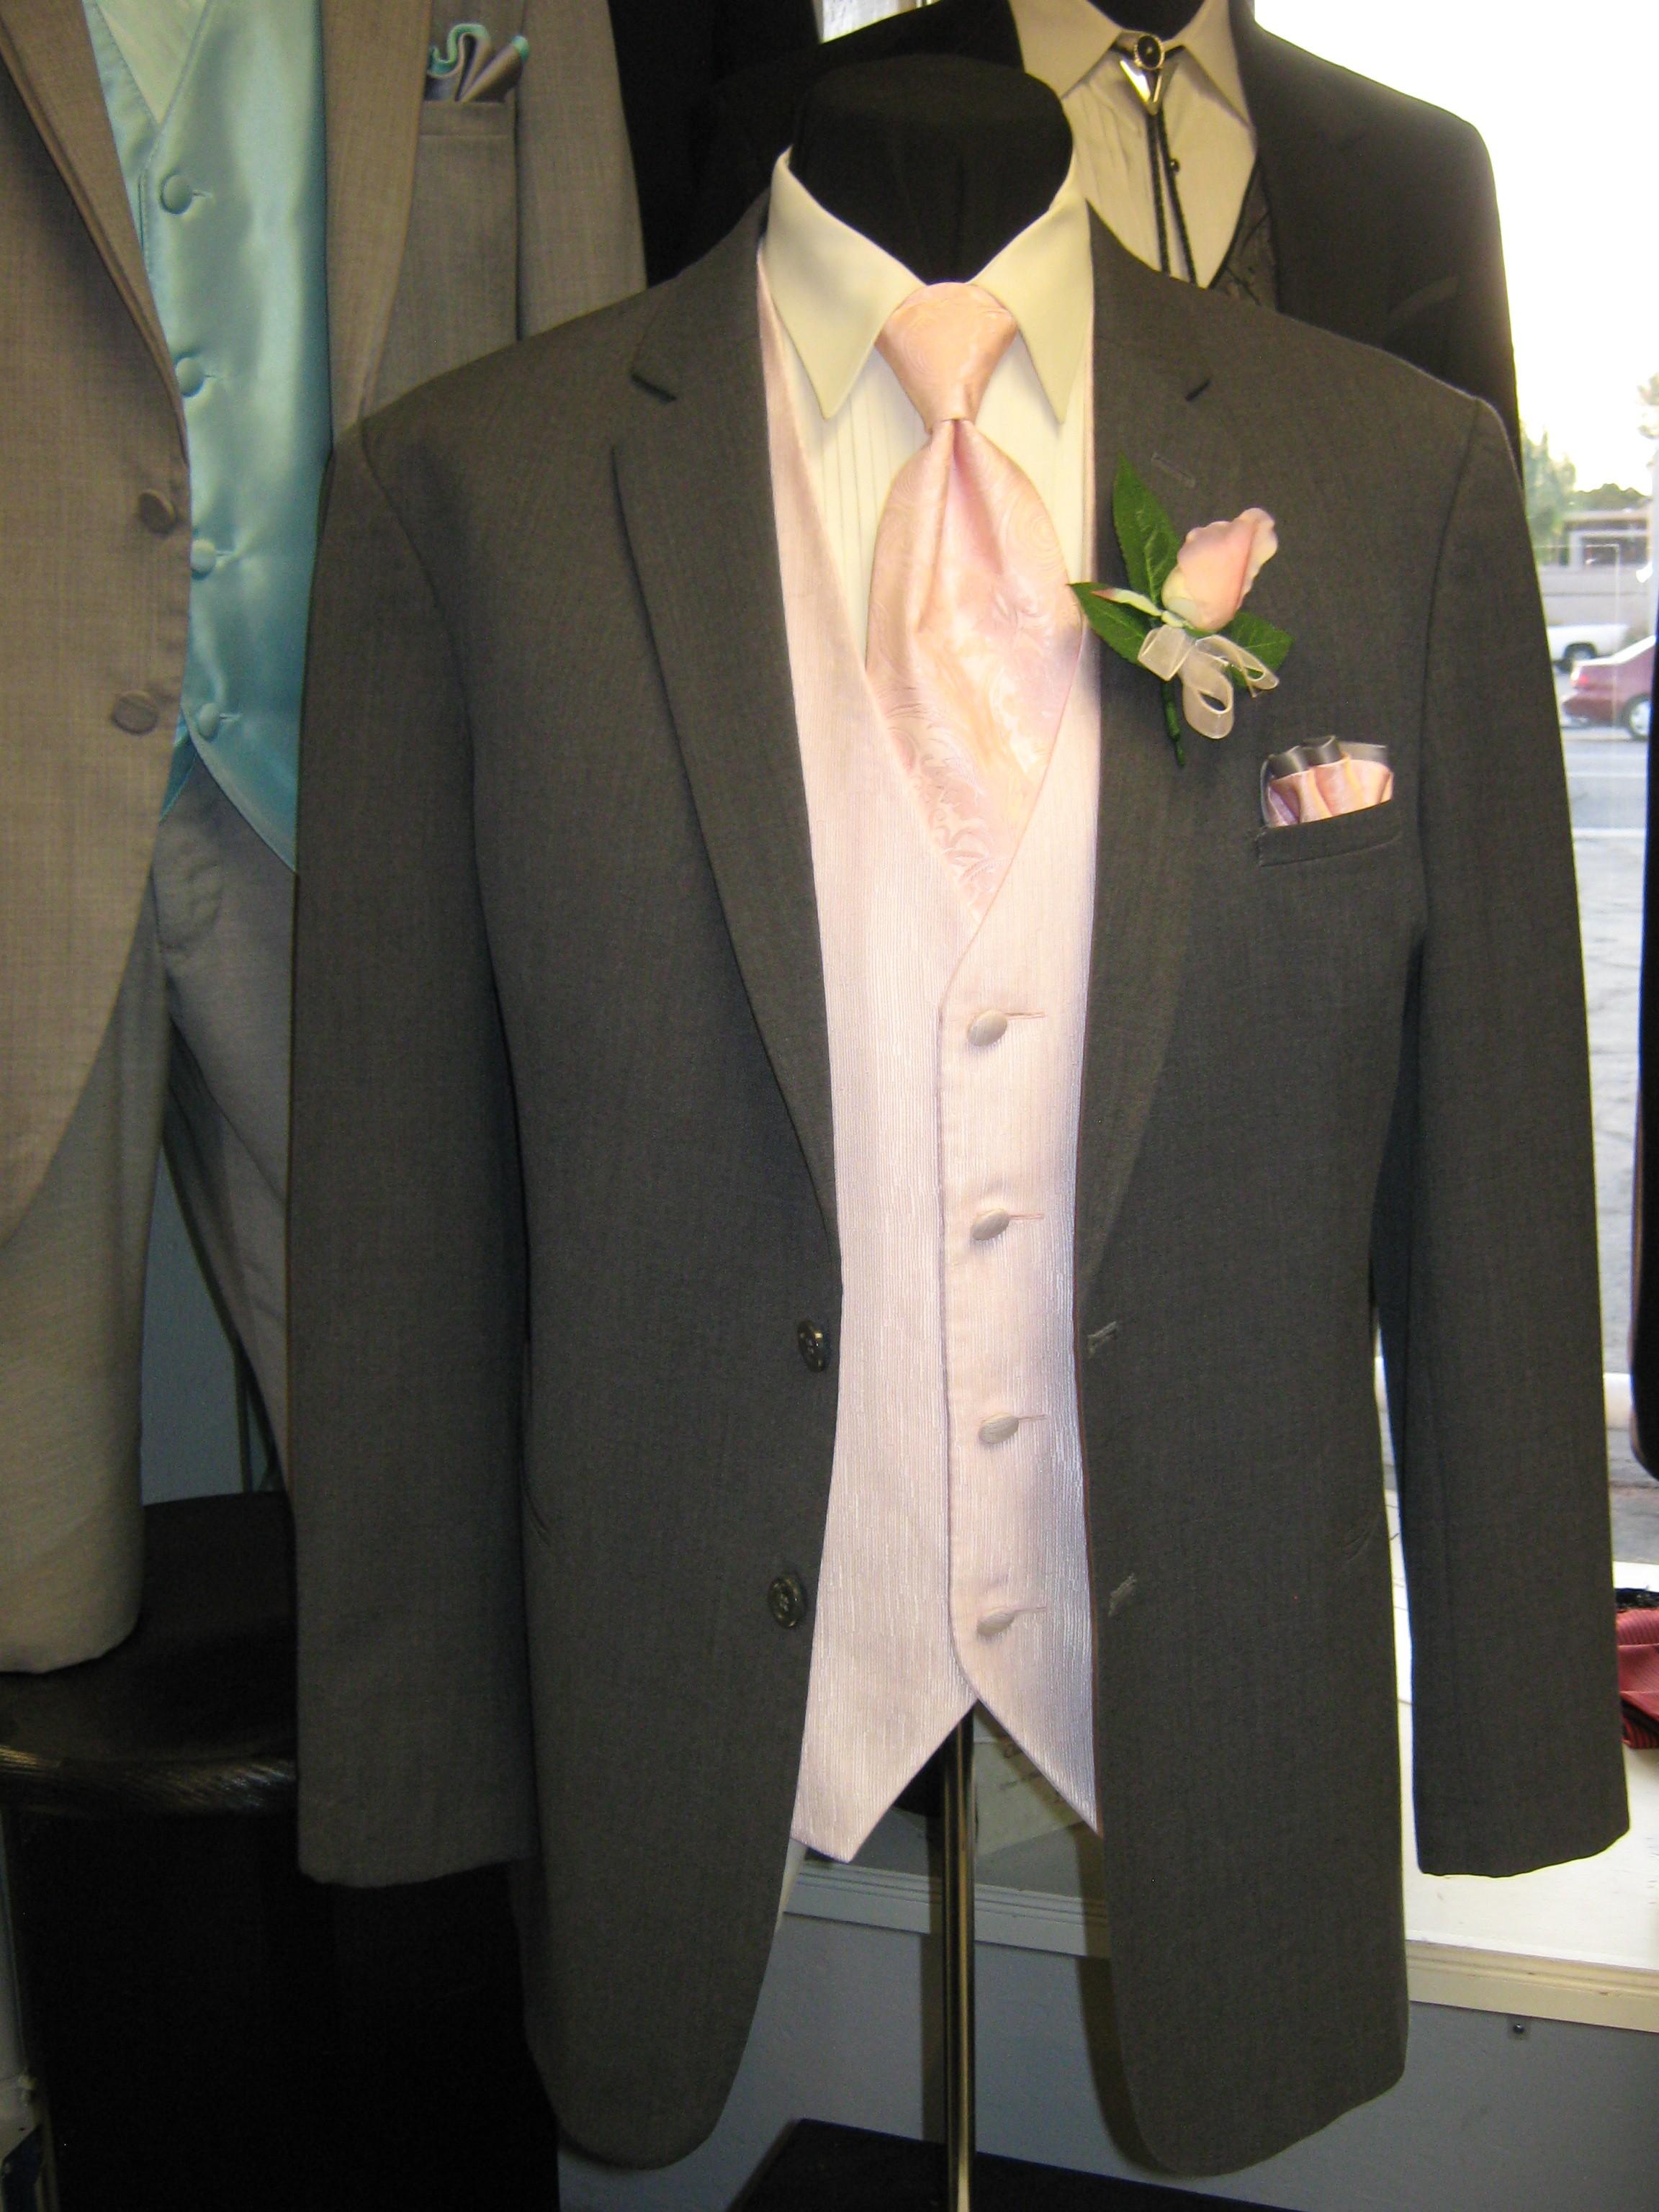 Quinceanera tuxedos for chambelanes - Rose Tuxedo: Wedding ...  Quinceanera tux...